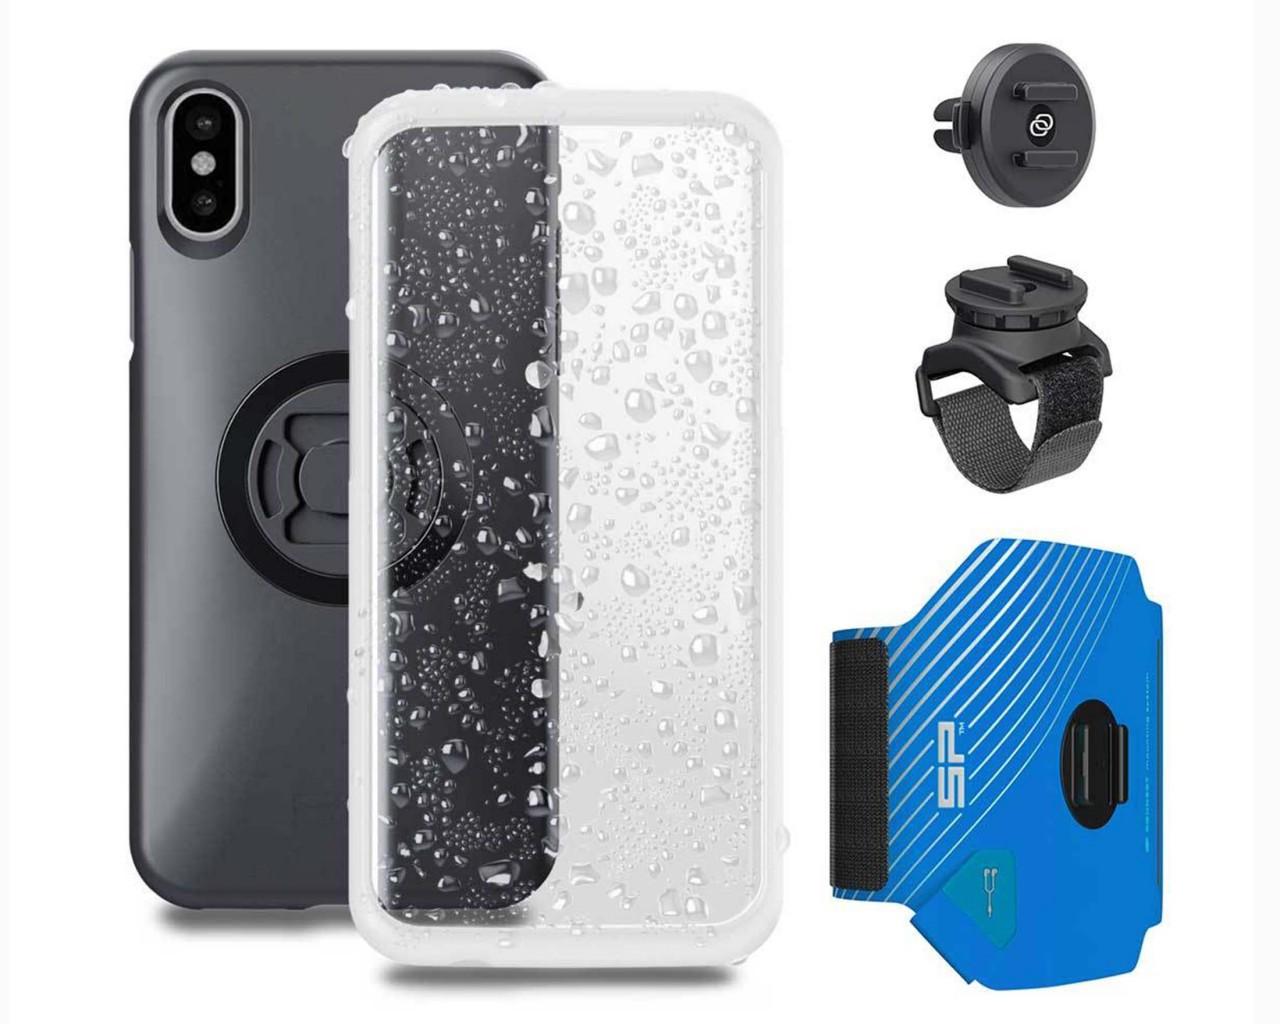 SP Connect Multi Activity Bundle Smartphone Case + Holder + Running Band